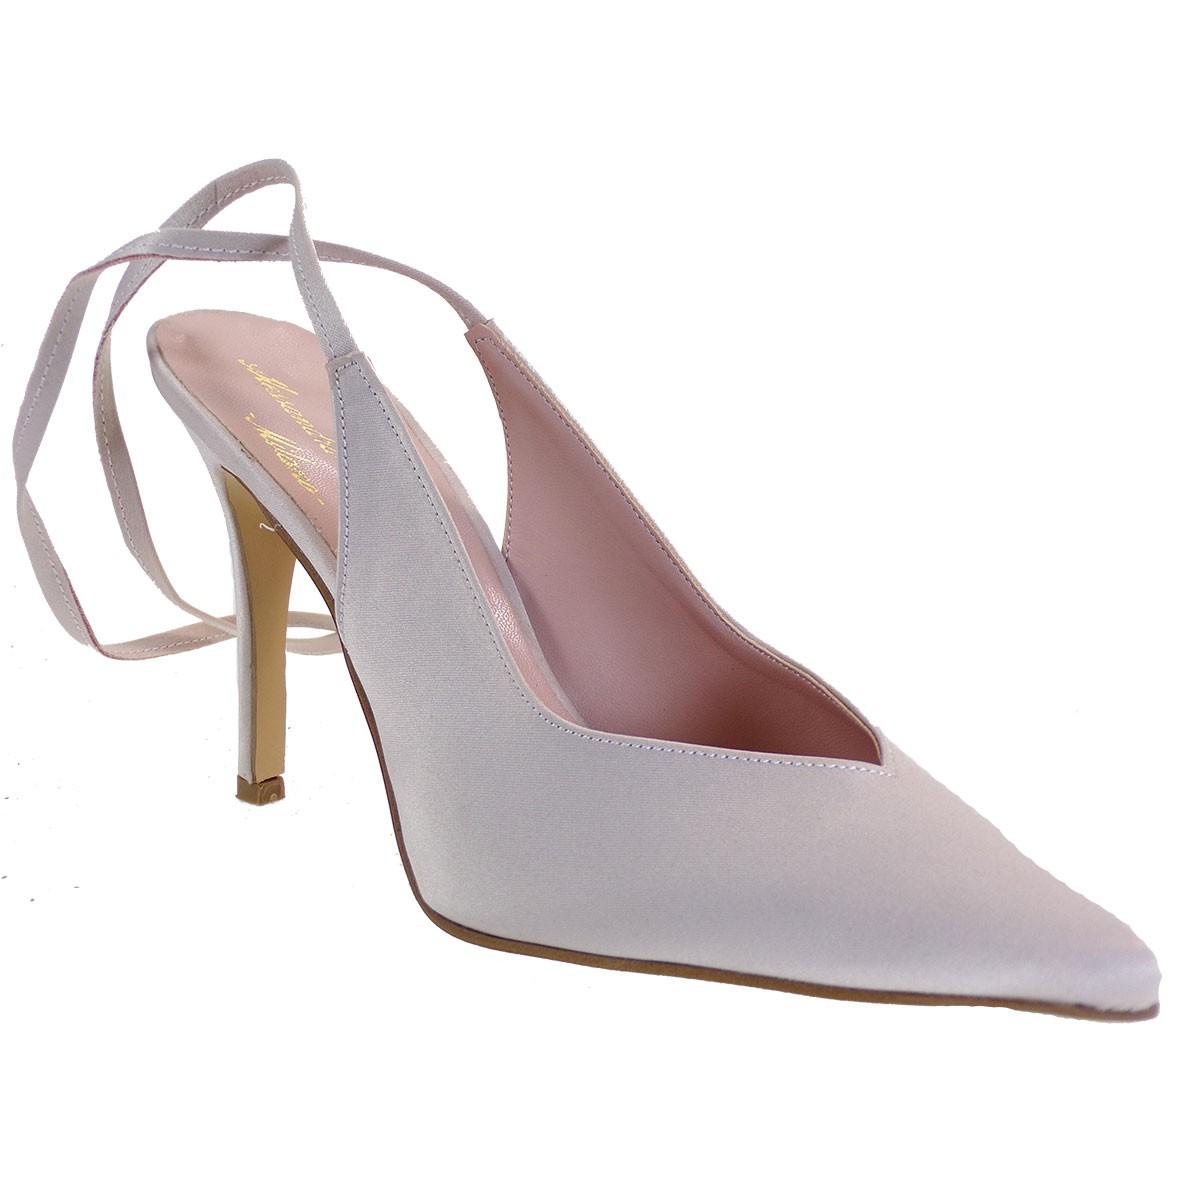 Alessandra Paggioti Γυναικεία Παπούτσια Γόβες 89685 Nude Σατέν